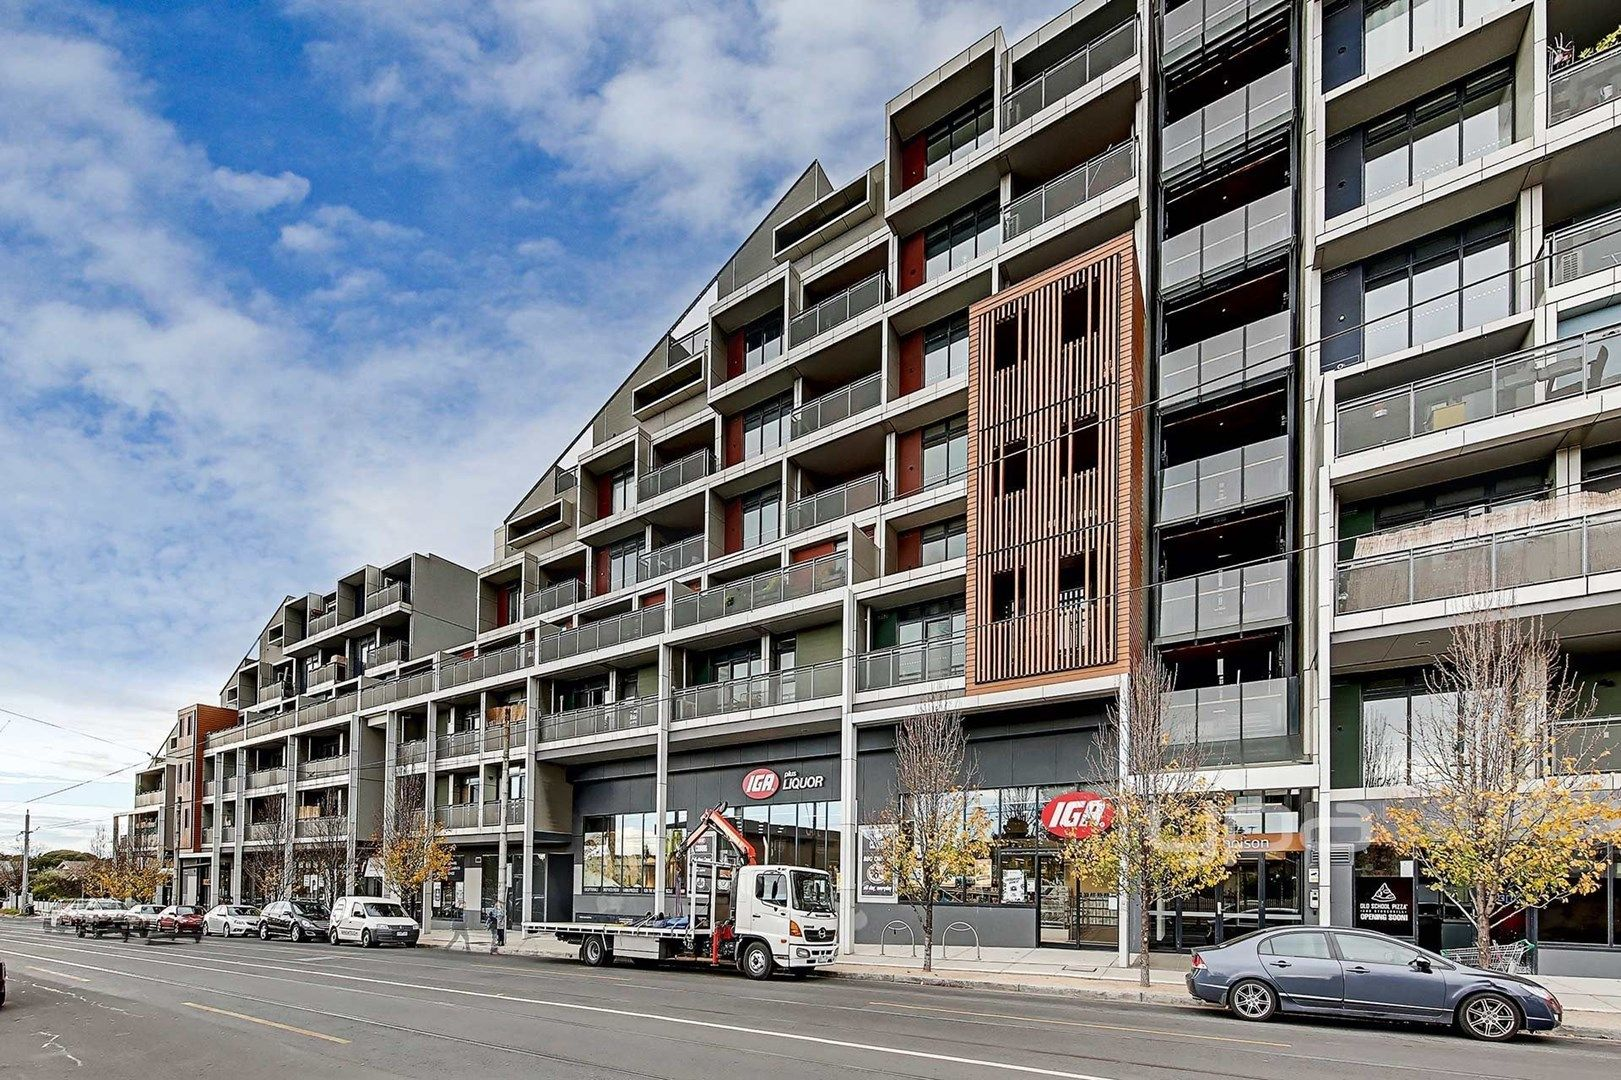 110/14-20 Nicholson Street, Coburg VIC 3058, Image 0